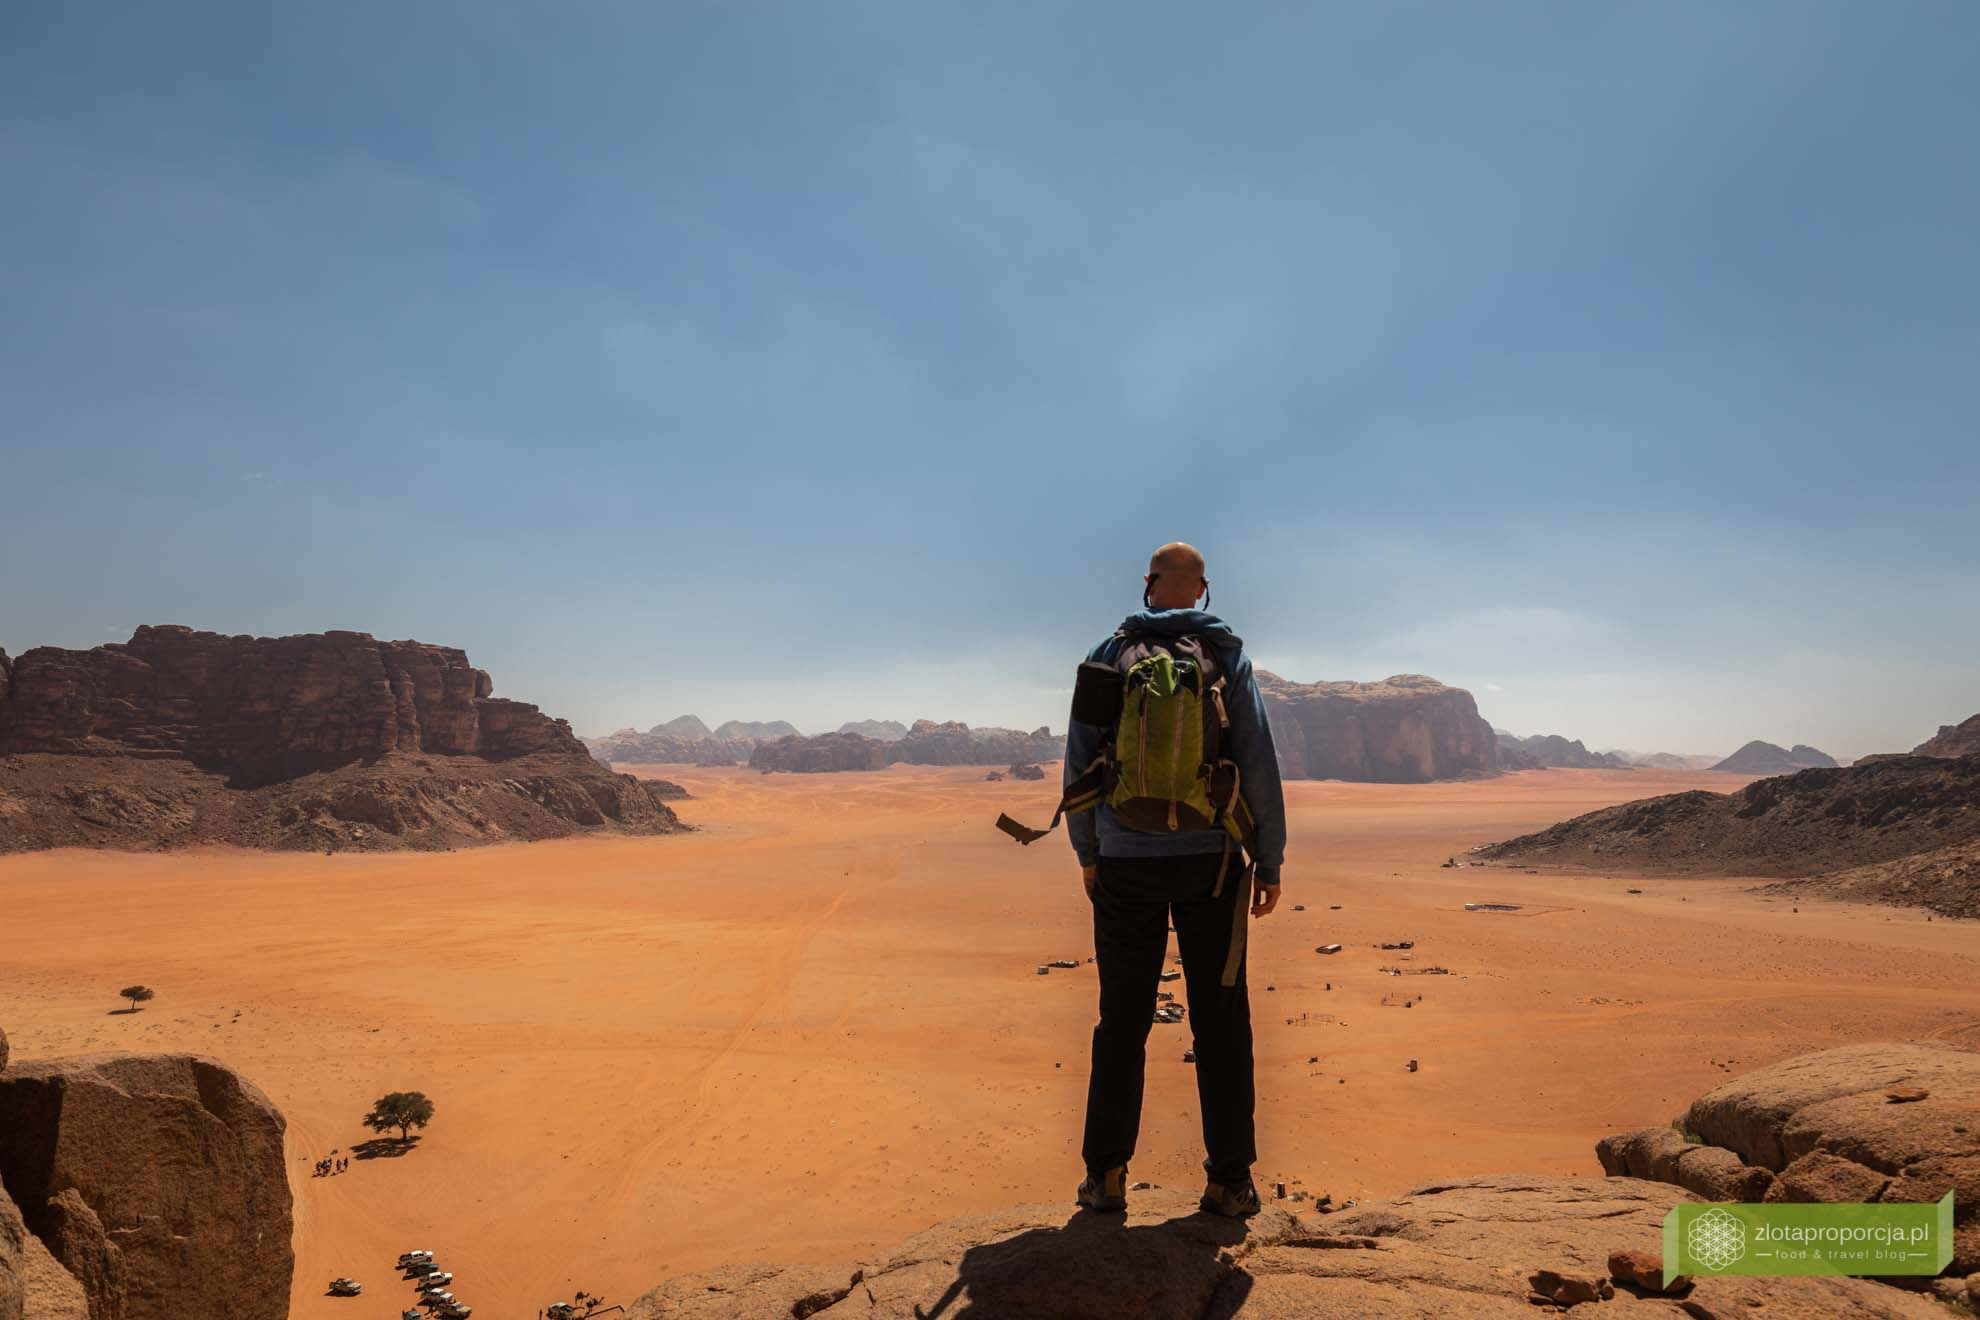 Jordania; Wadi Rum, pustynia Wadi Rum, pustynia w Jordanii;